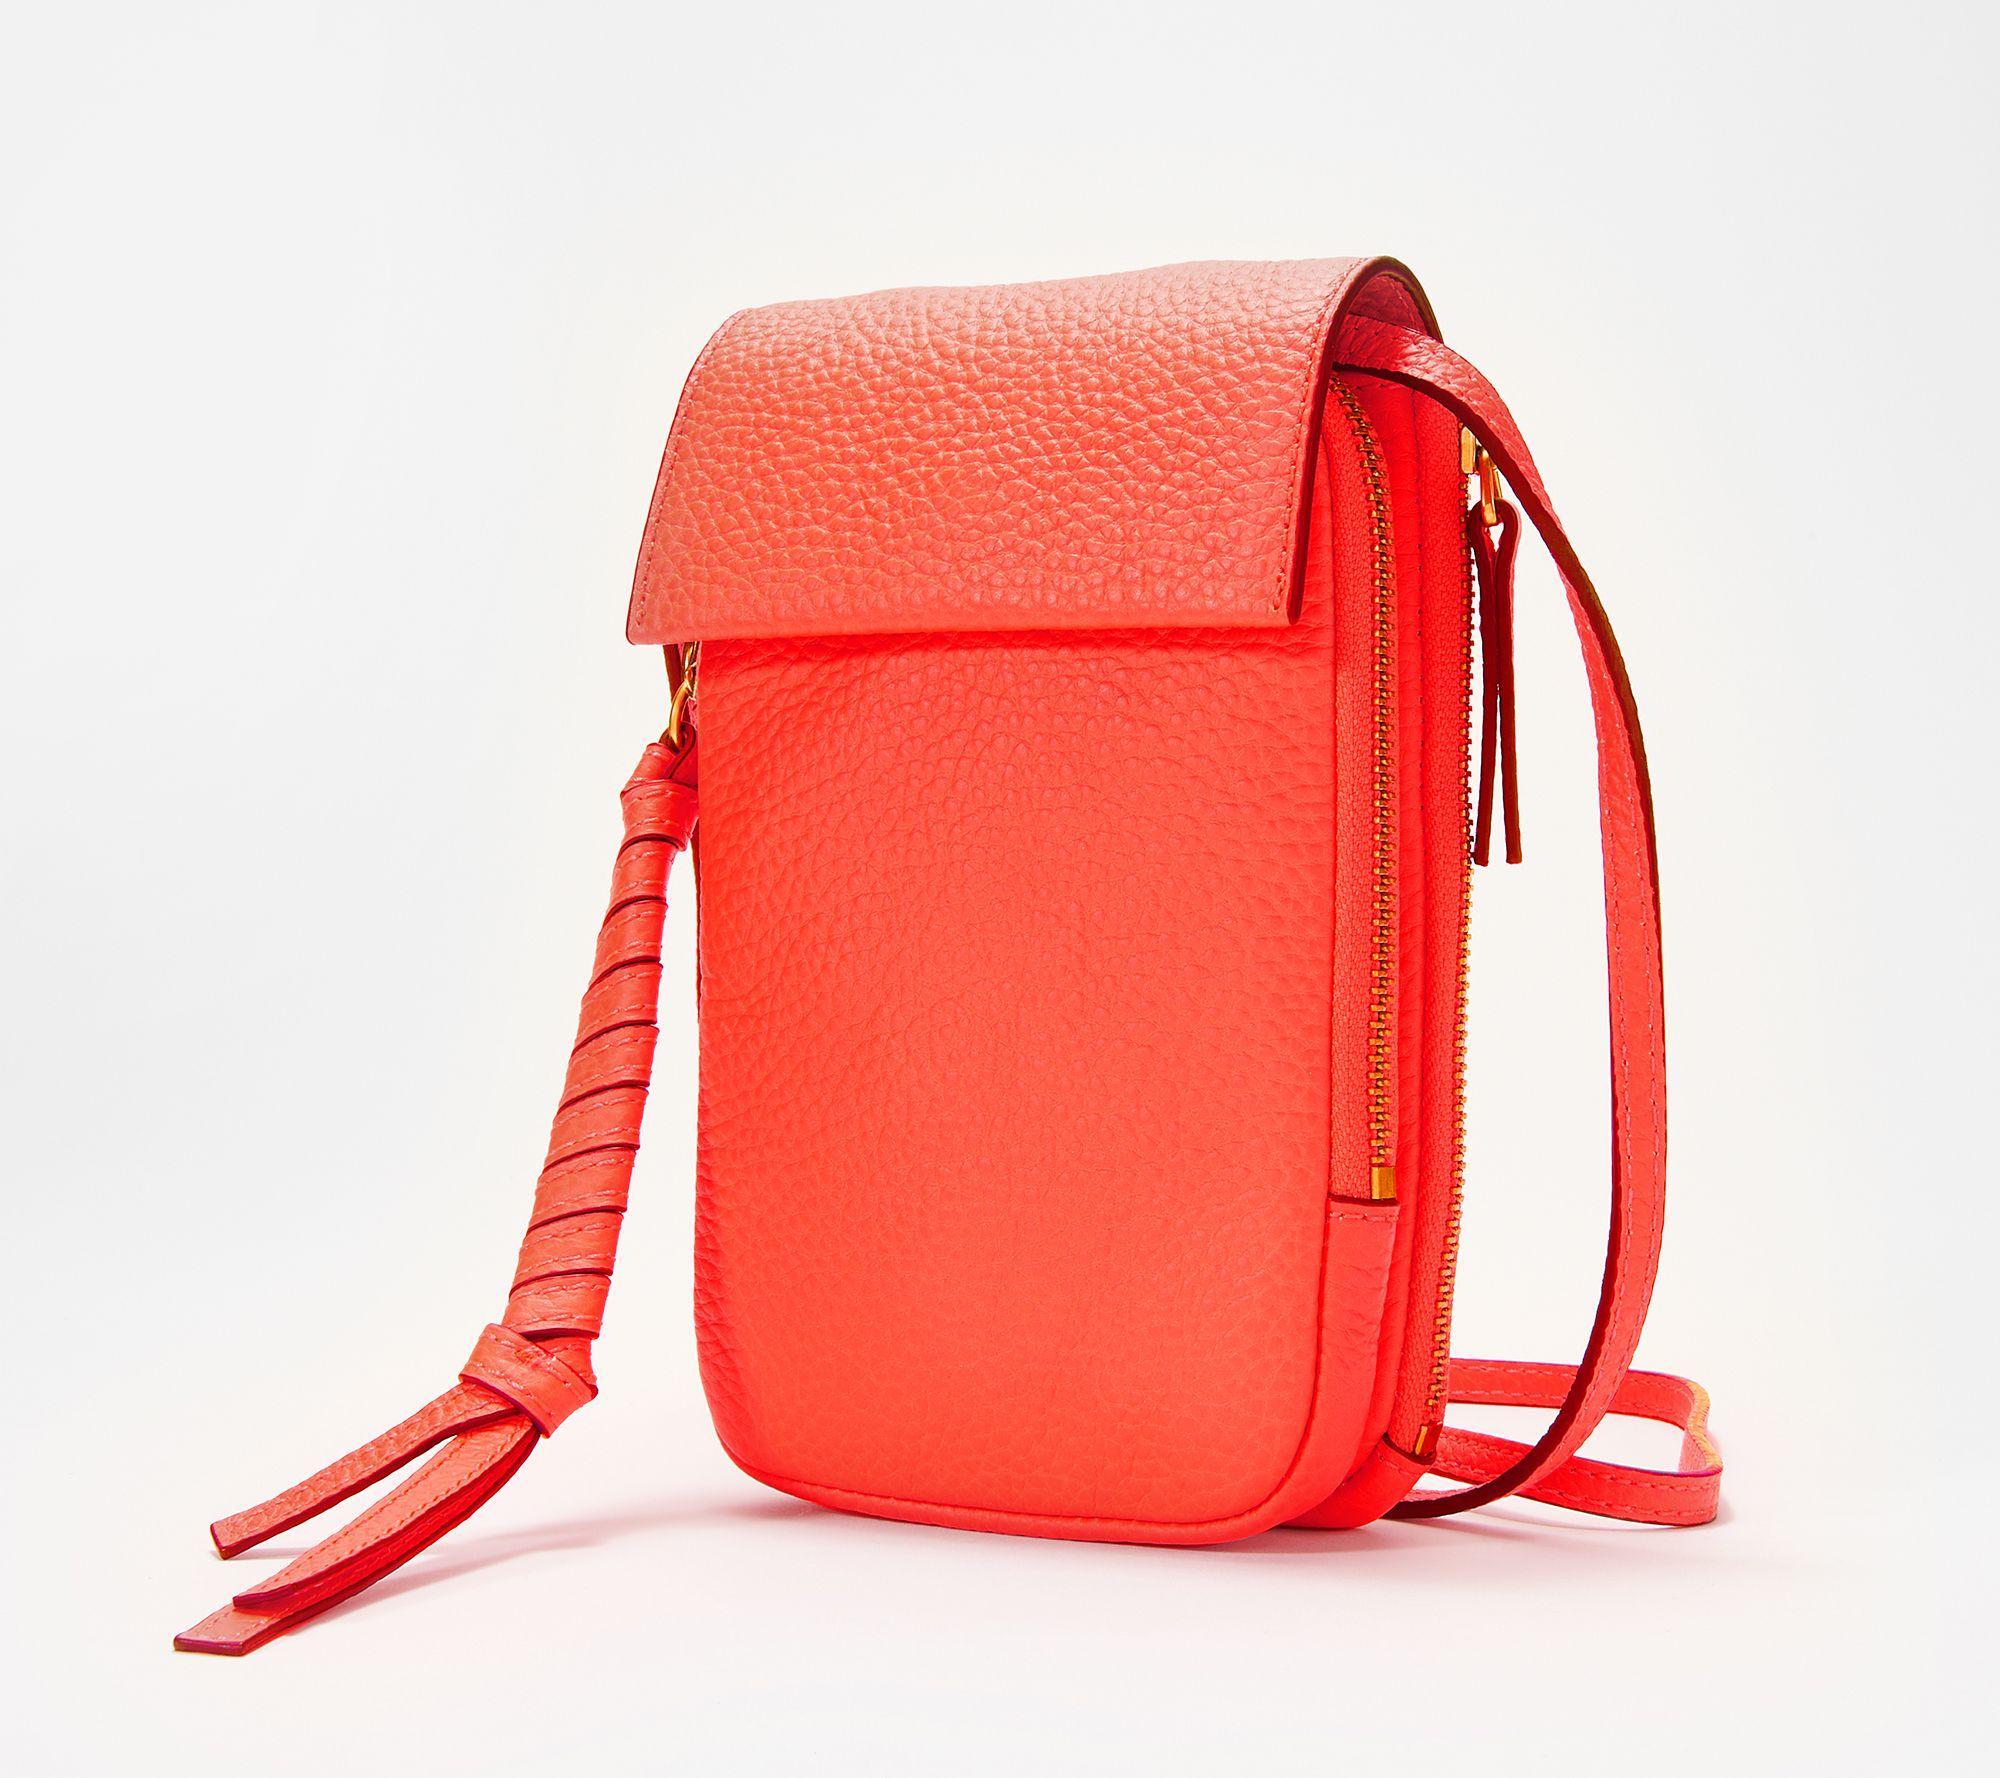 Hobos & Shoulder Bags Women's Handbags Ploekgda Casual Shopping Street Crossbody Bag Women Shoulder Bag Retro Leather Handbag Shoulder Bag Color : Red